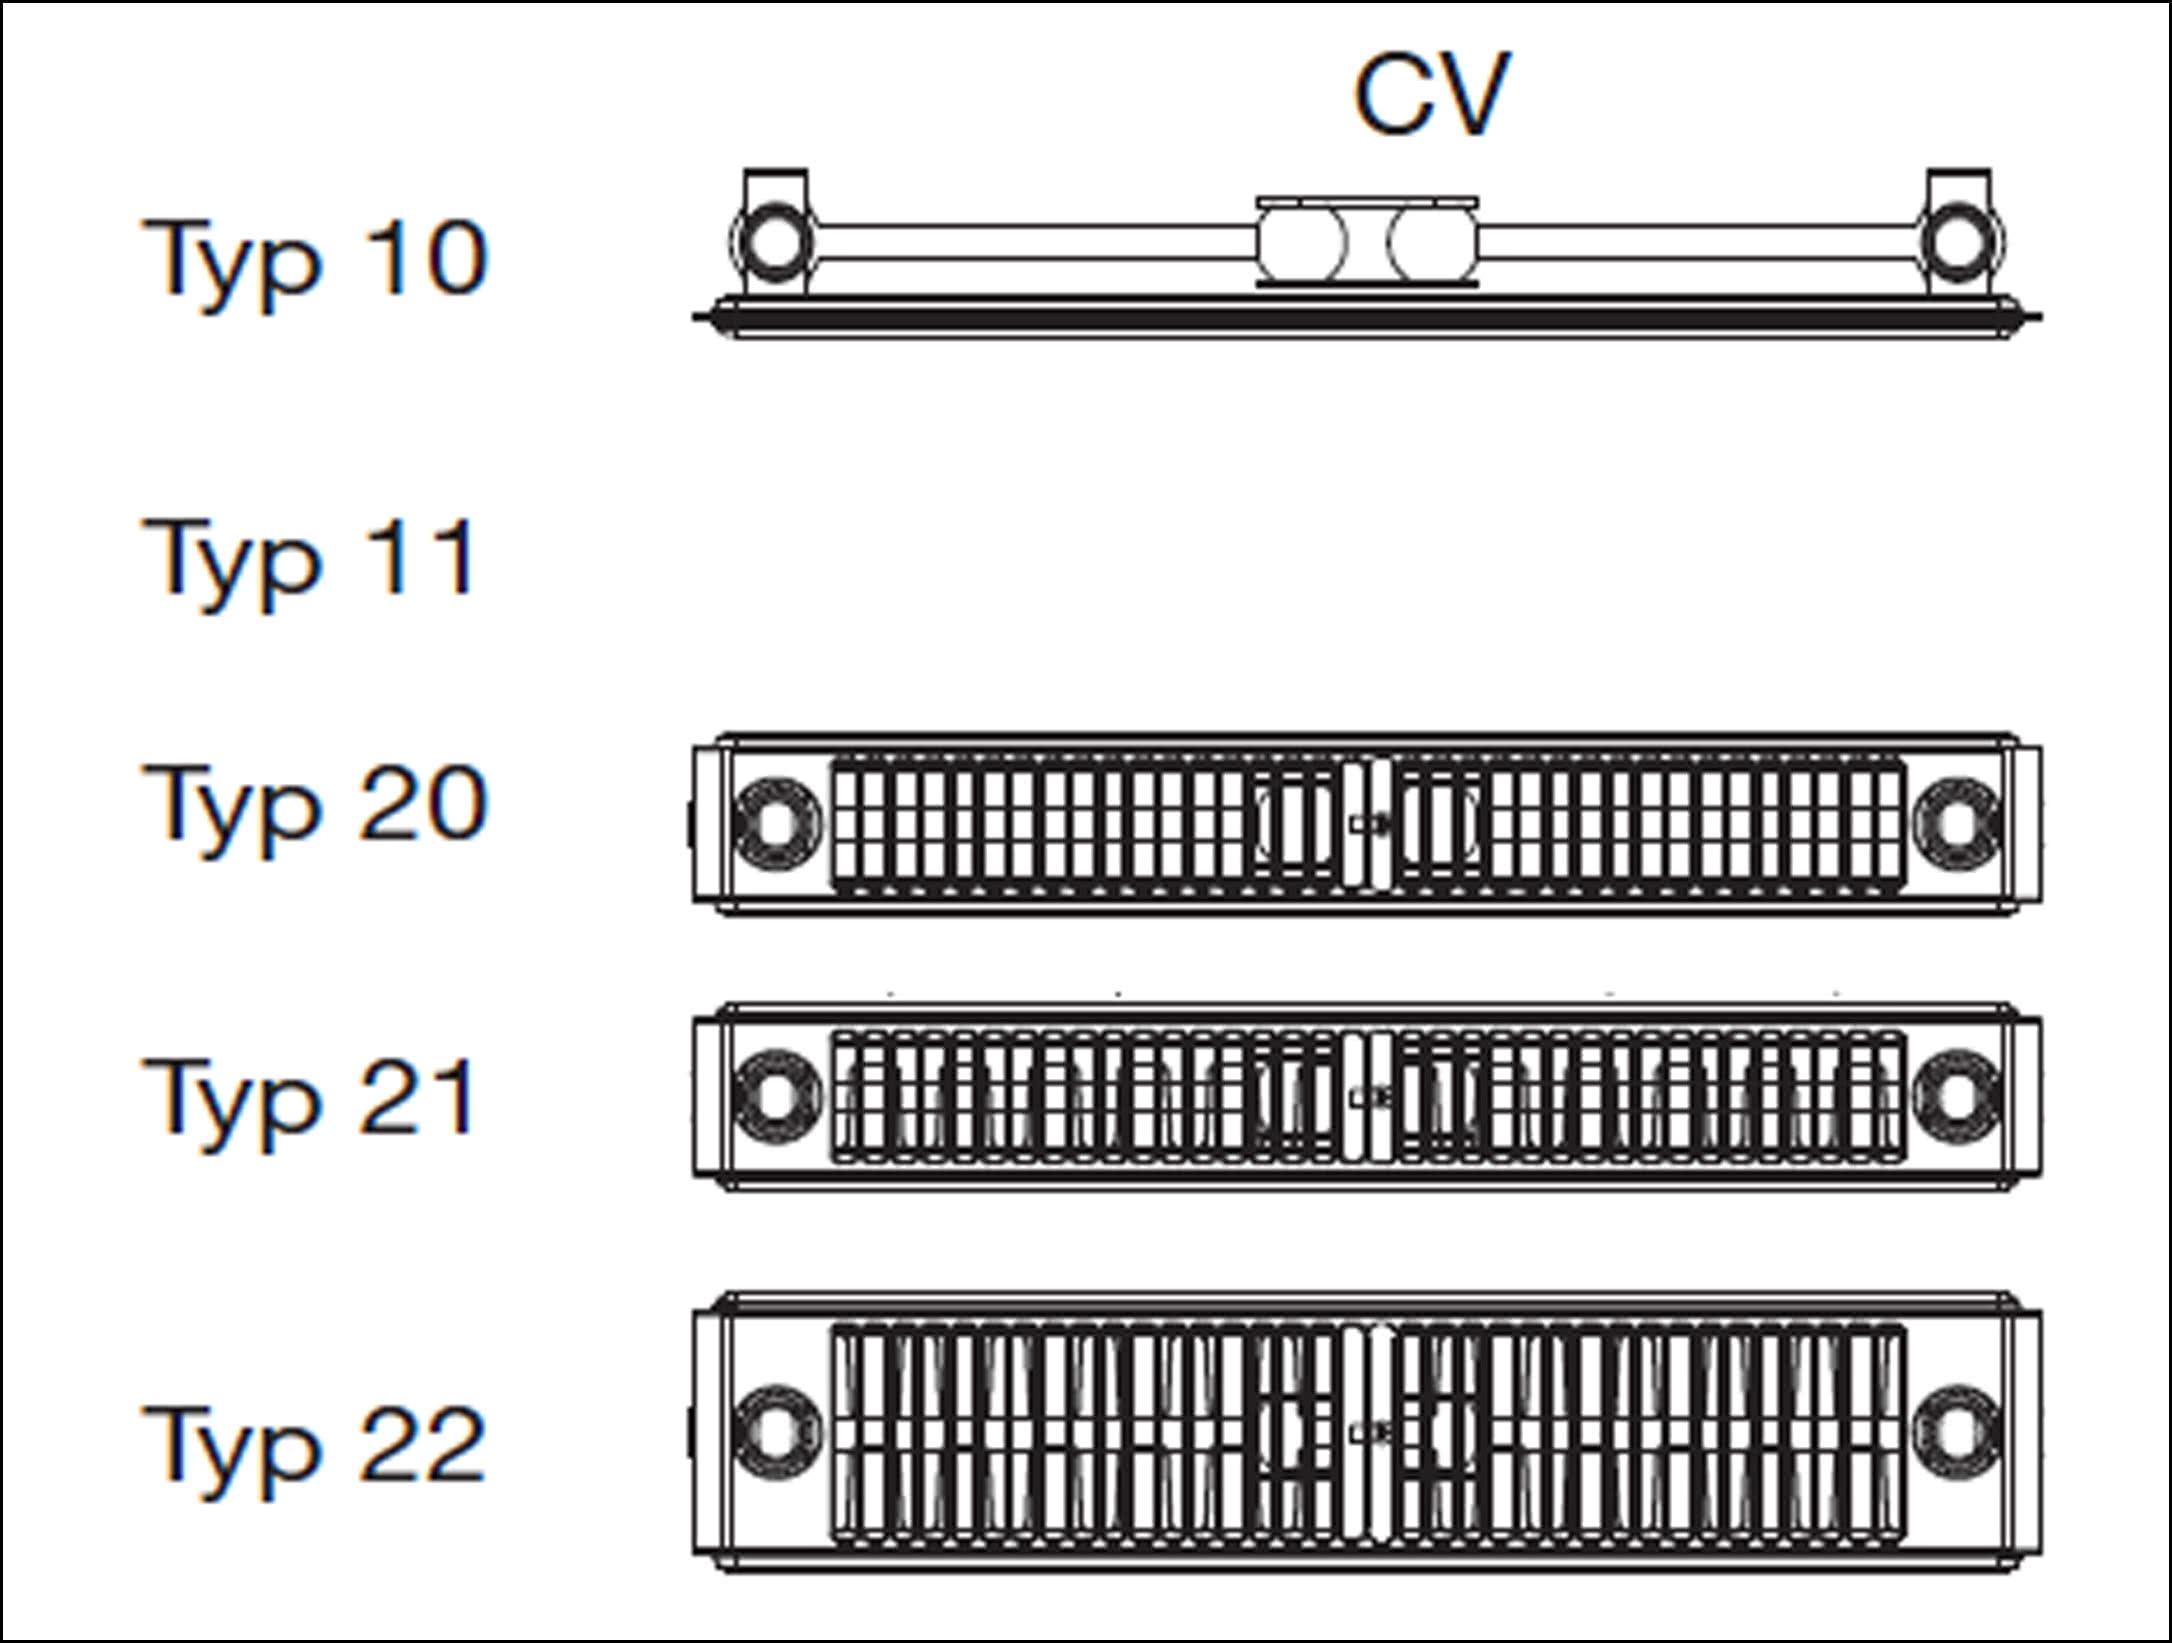 Relativ Buderus Vertikal-Heizkörper mit profilierter Front - CV-Profil TH65